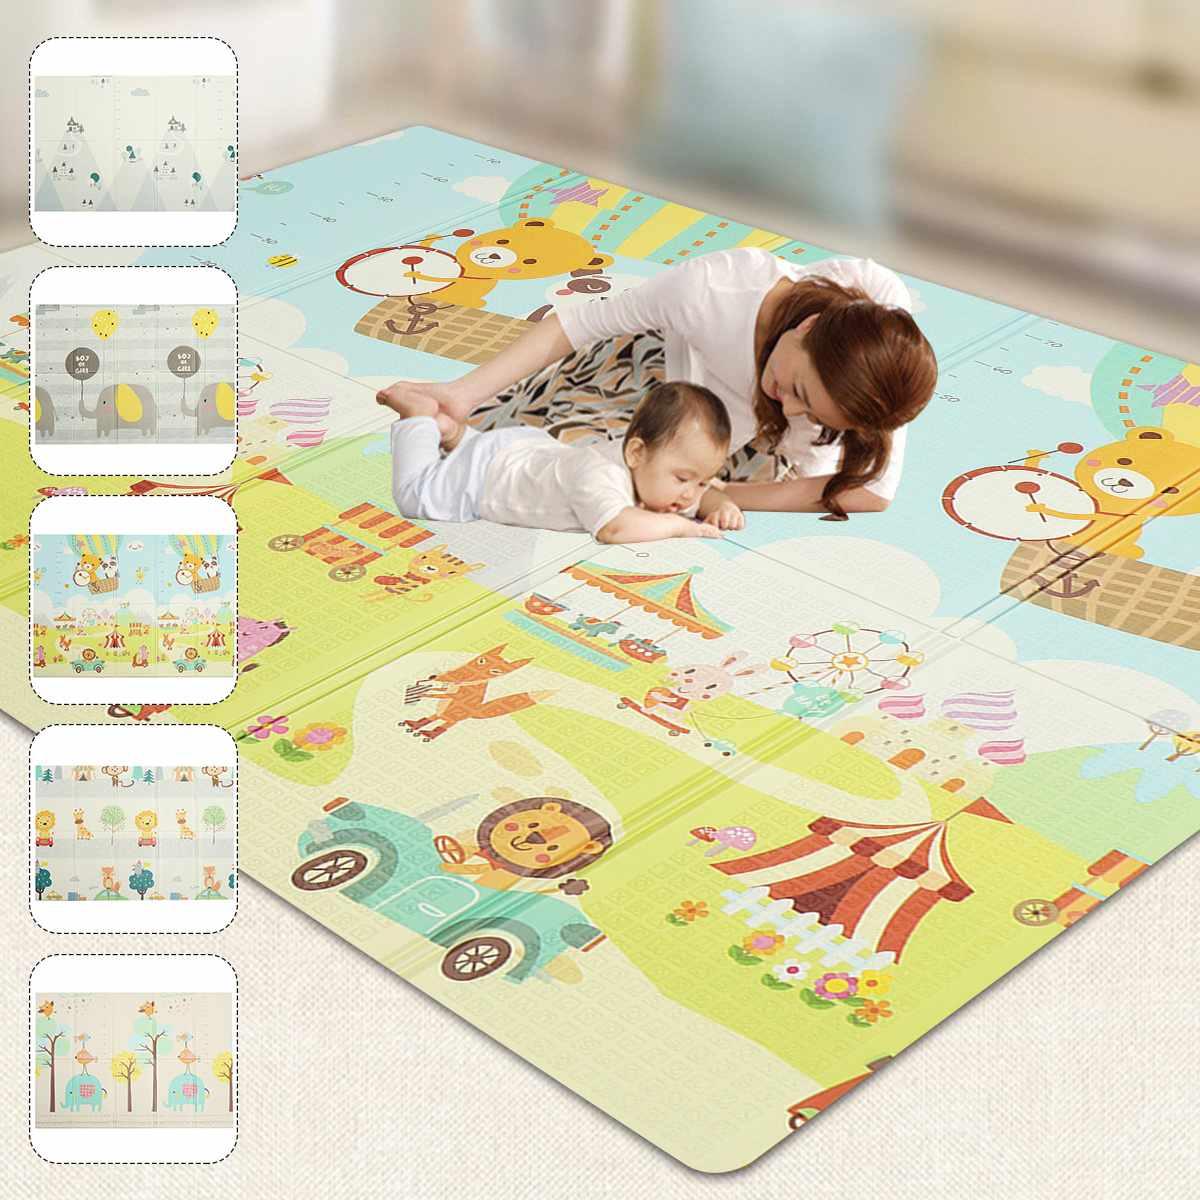 Foldable Baby Crawling Play Mat 200x150cm Thicked XPE Play Mat Dual-use Rug Floor Carpet Waterproof Climbing Mat Pad Playmat